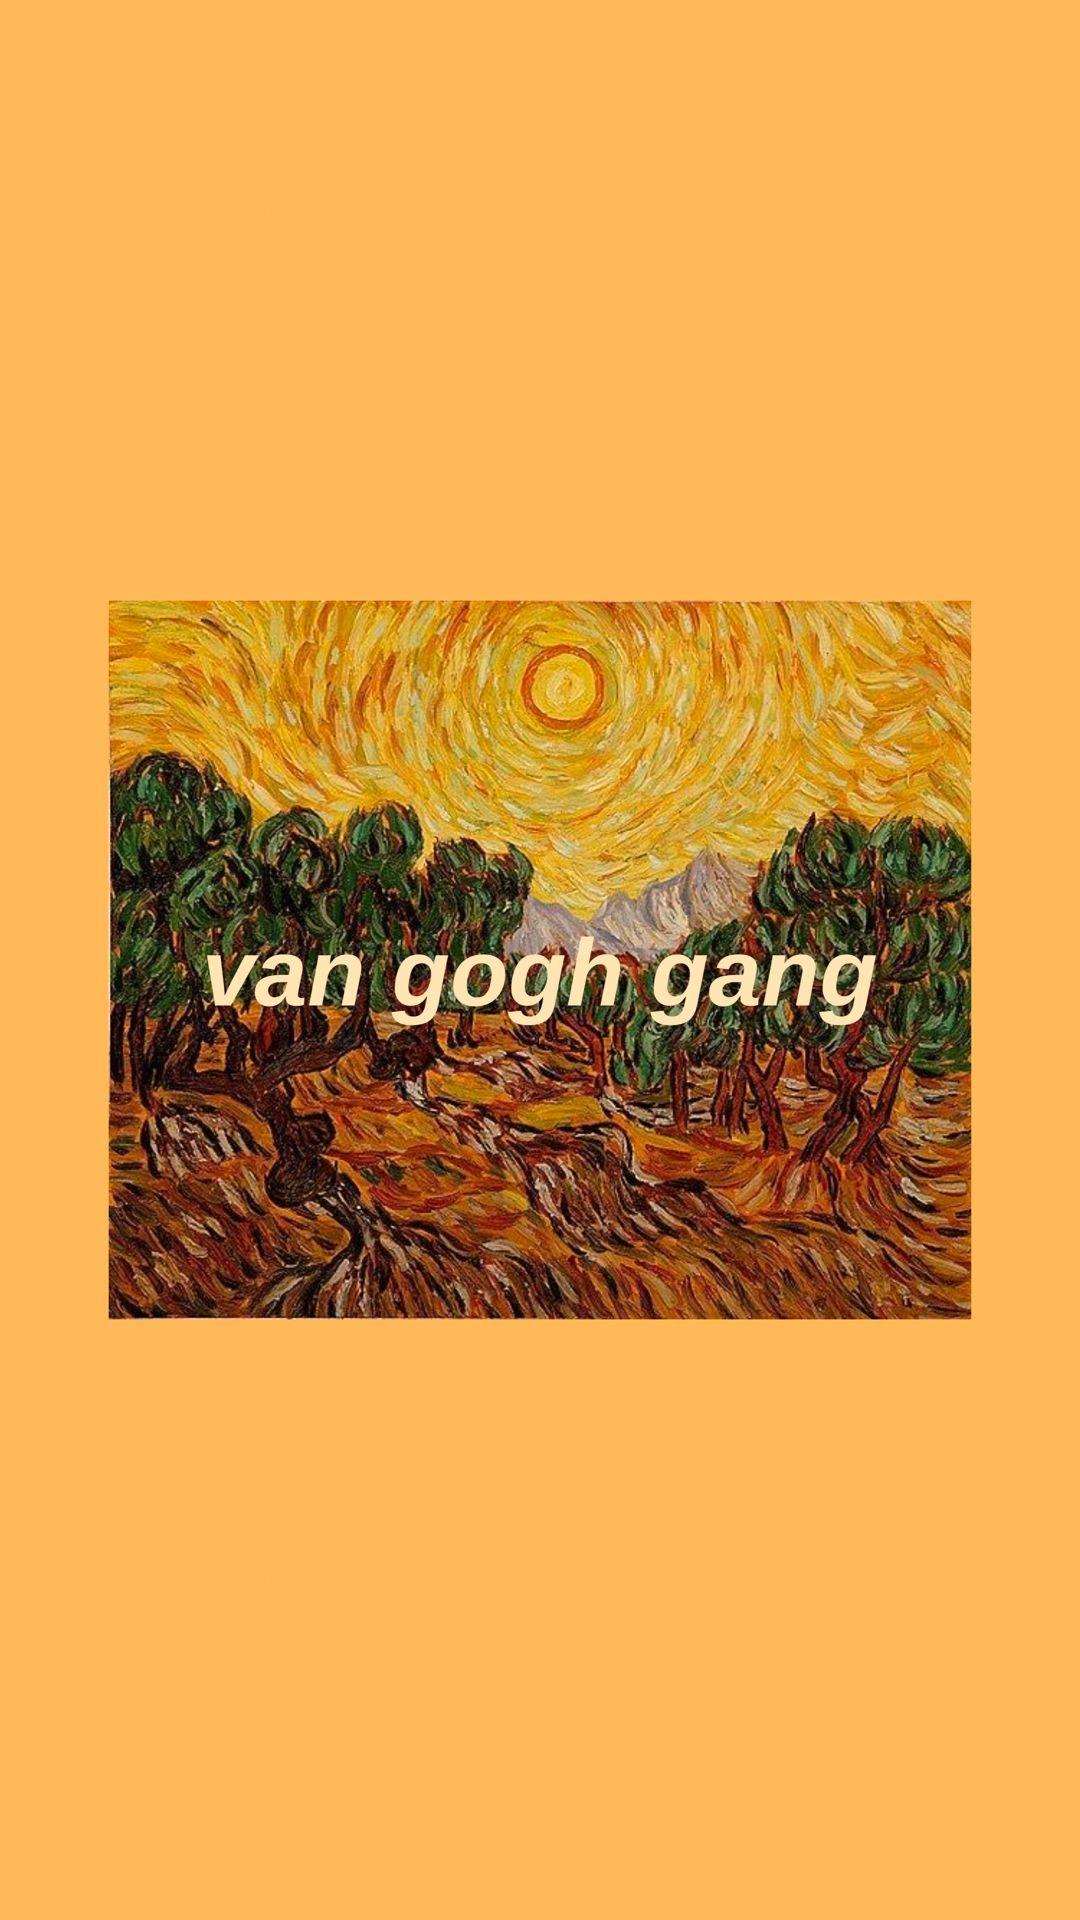 Van Gogh Gang Wallpaper By Me Hiimbee Samsung Wallpaper Art